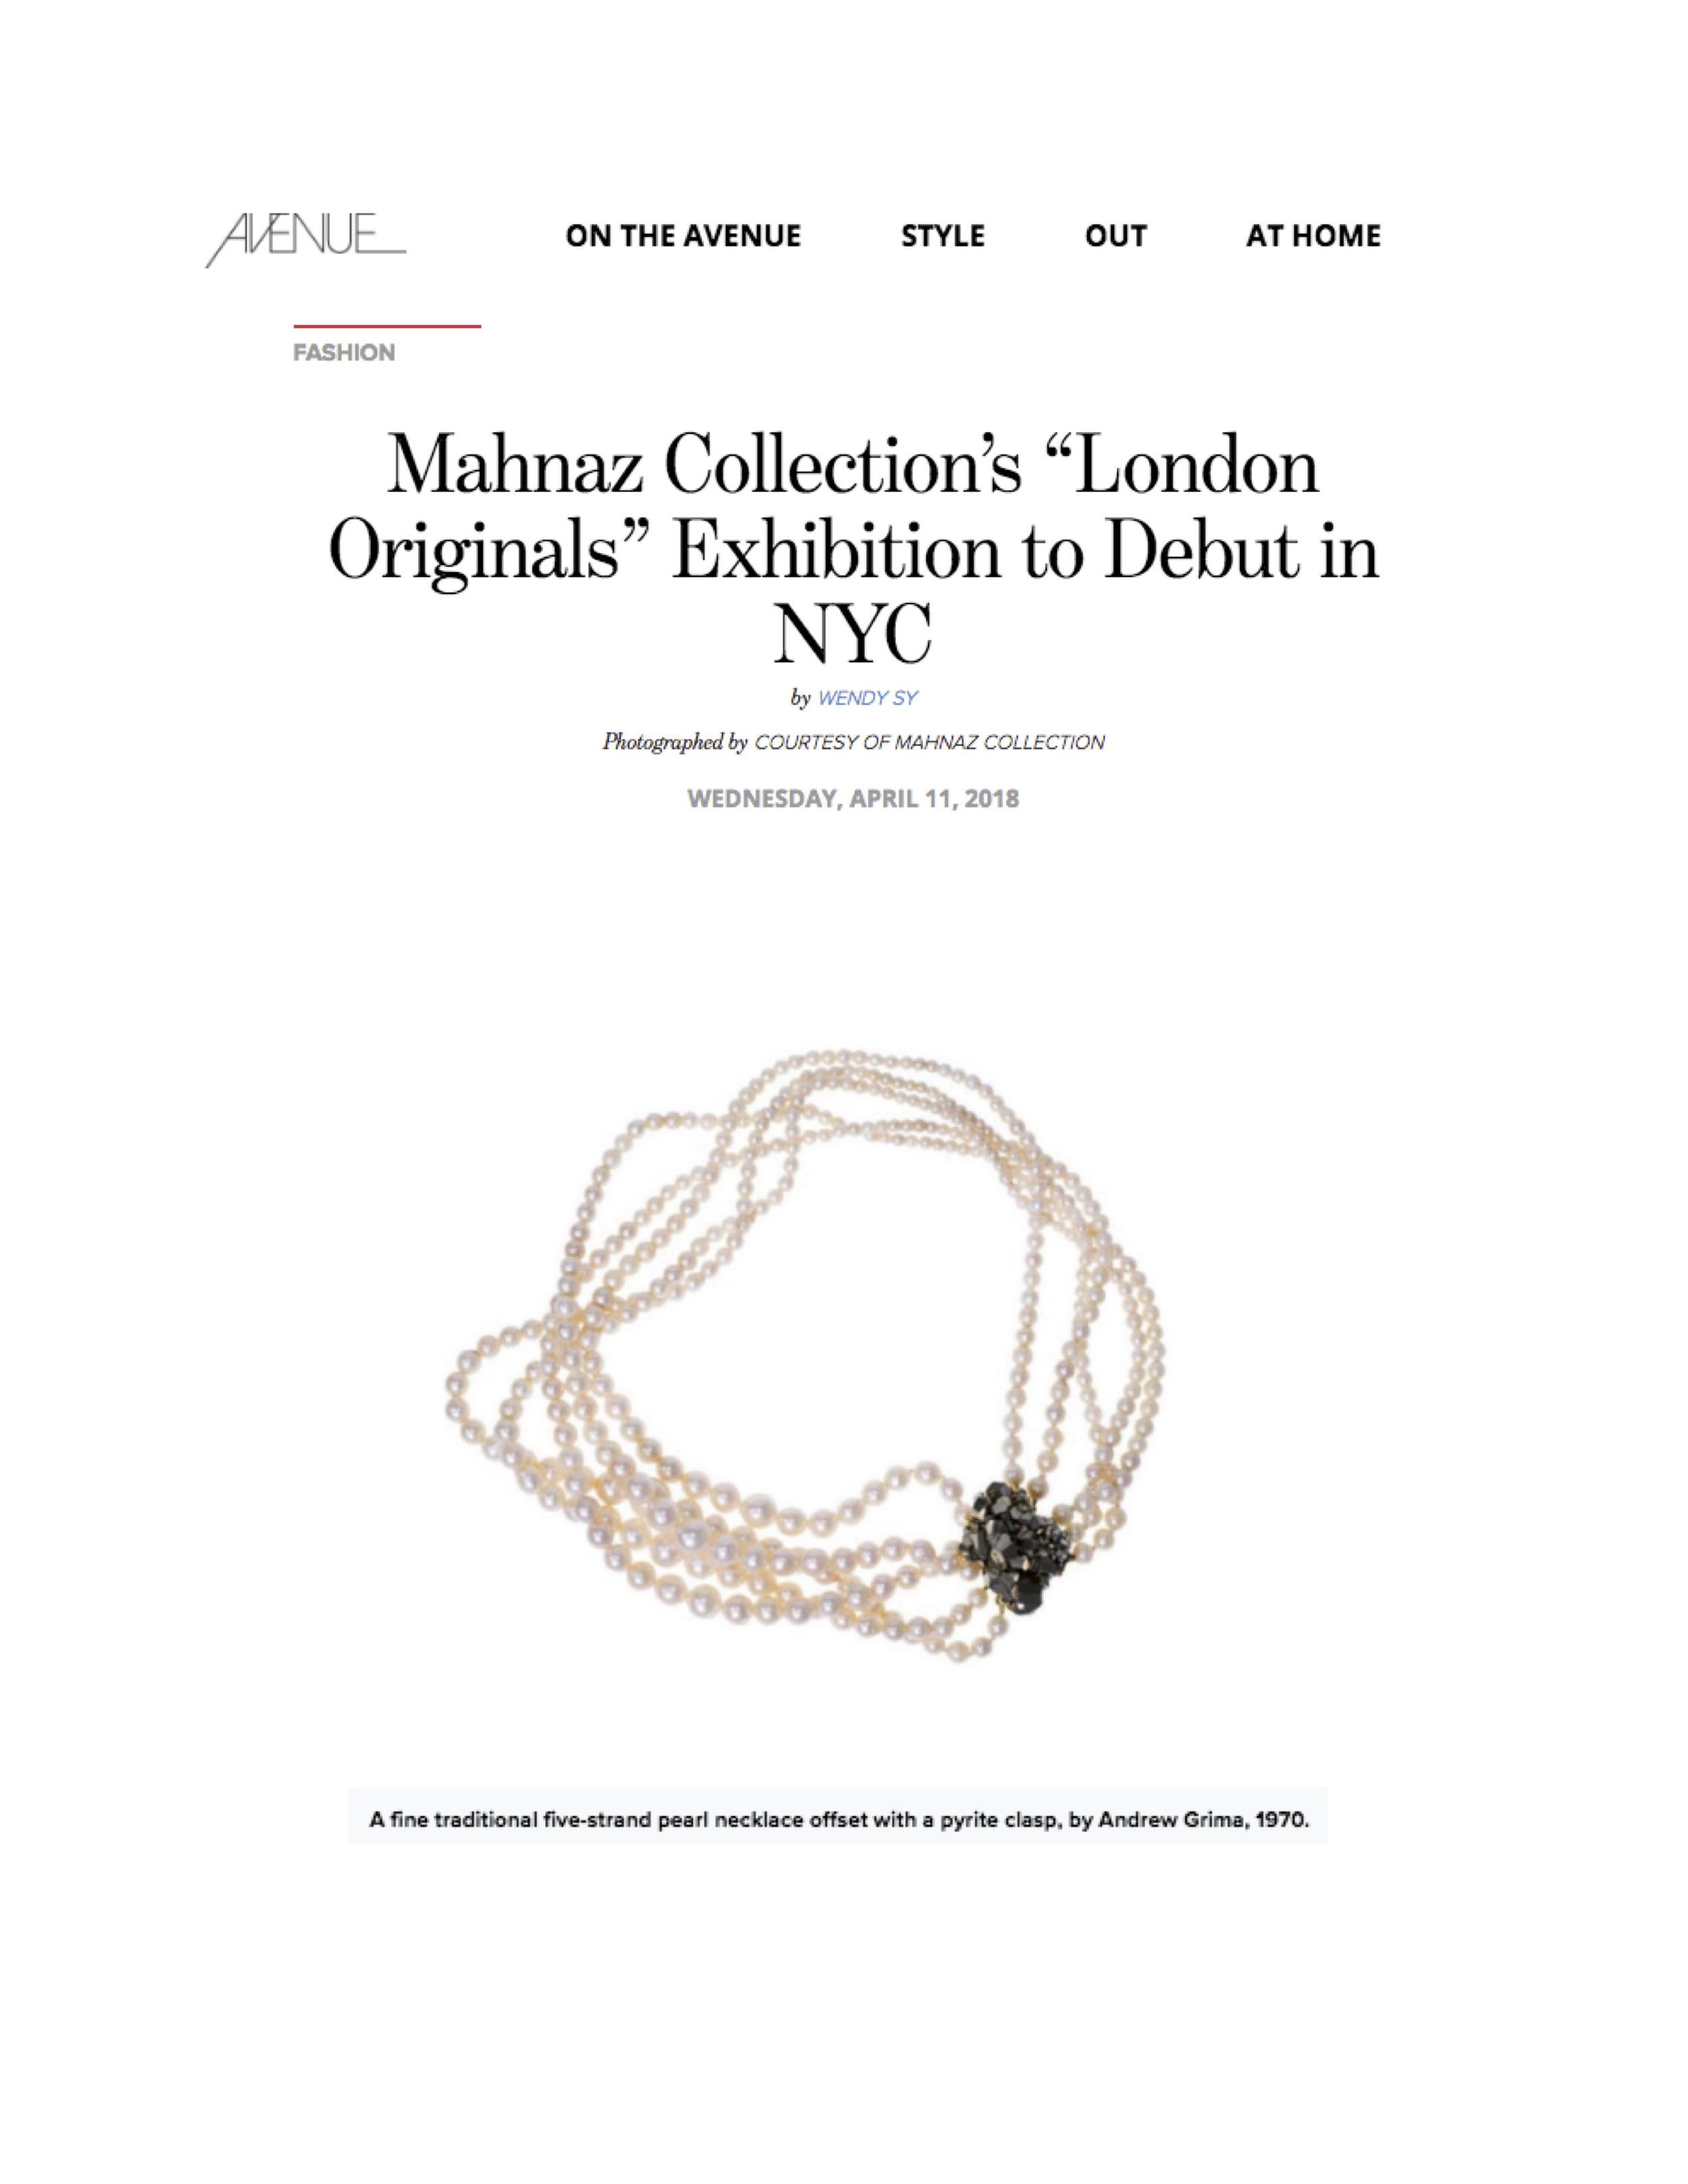 Mahnaz Collection Press Book  London Originals 2018 copy (dragged) 7 copy.jpg